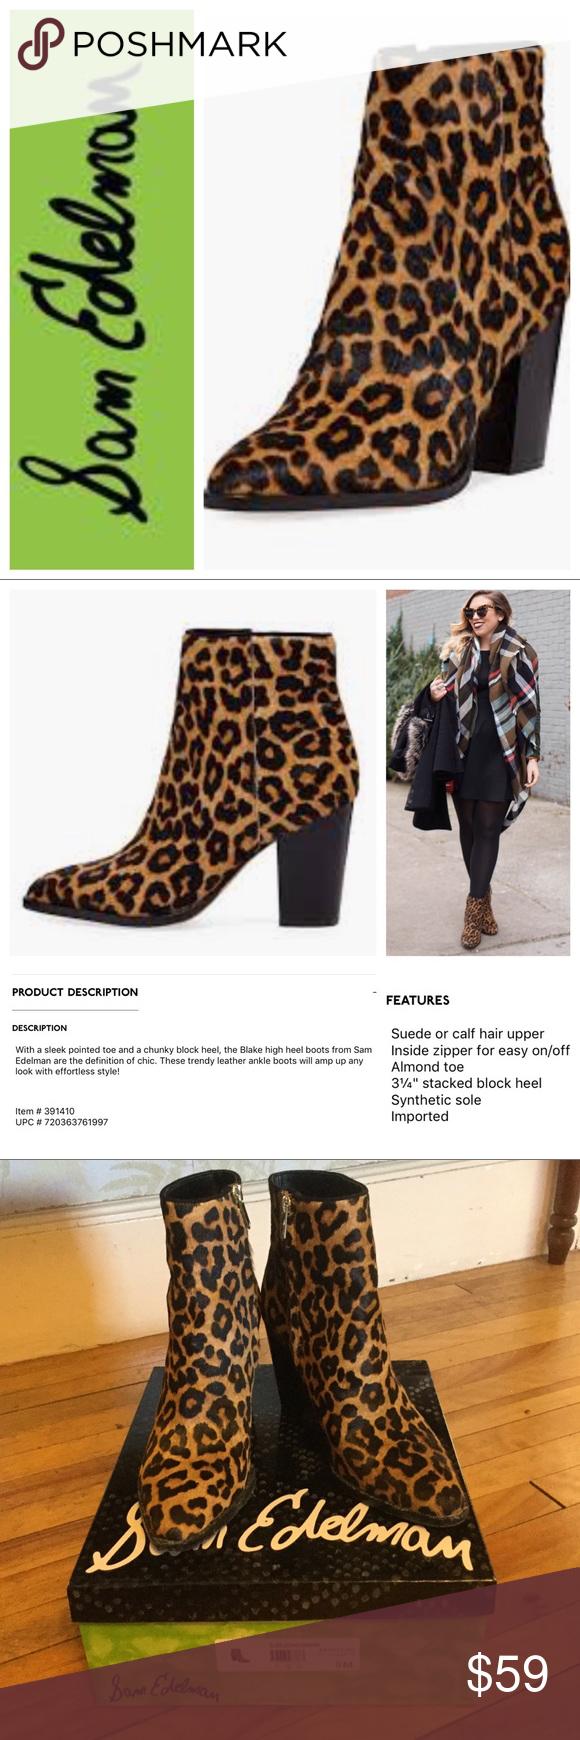 9d7f2b014 Sam Edelman Blake Leopard Brahma boots booties 9 Only worn once